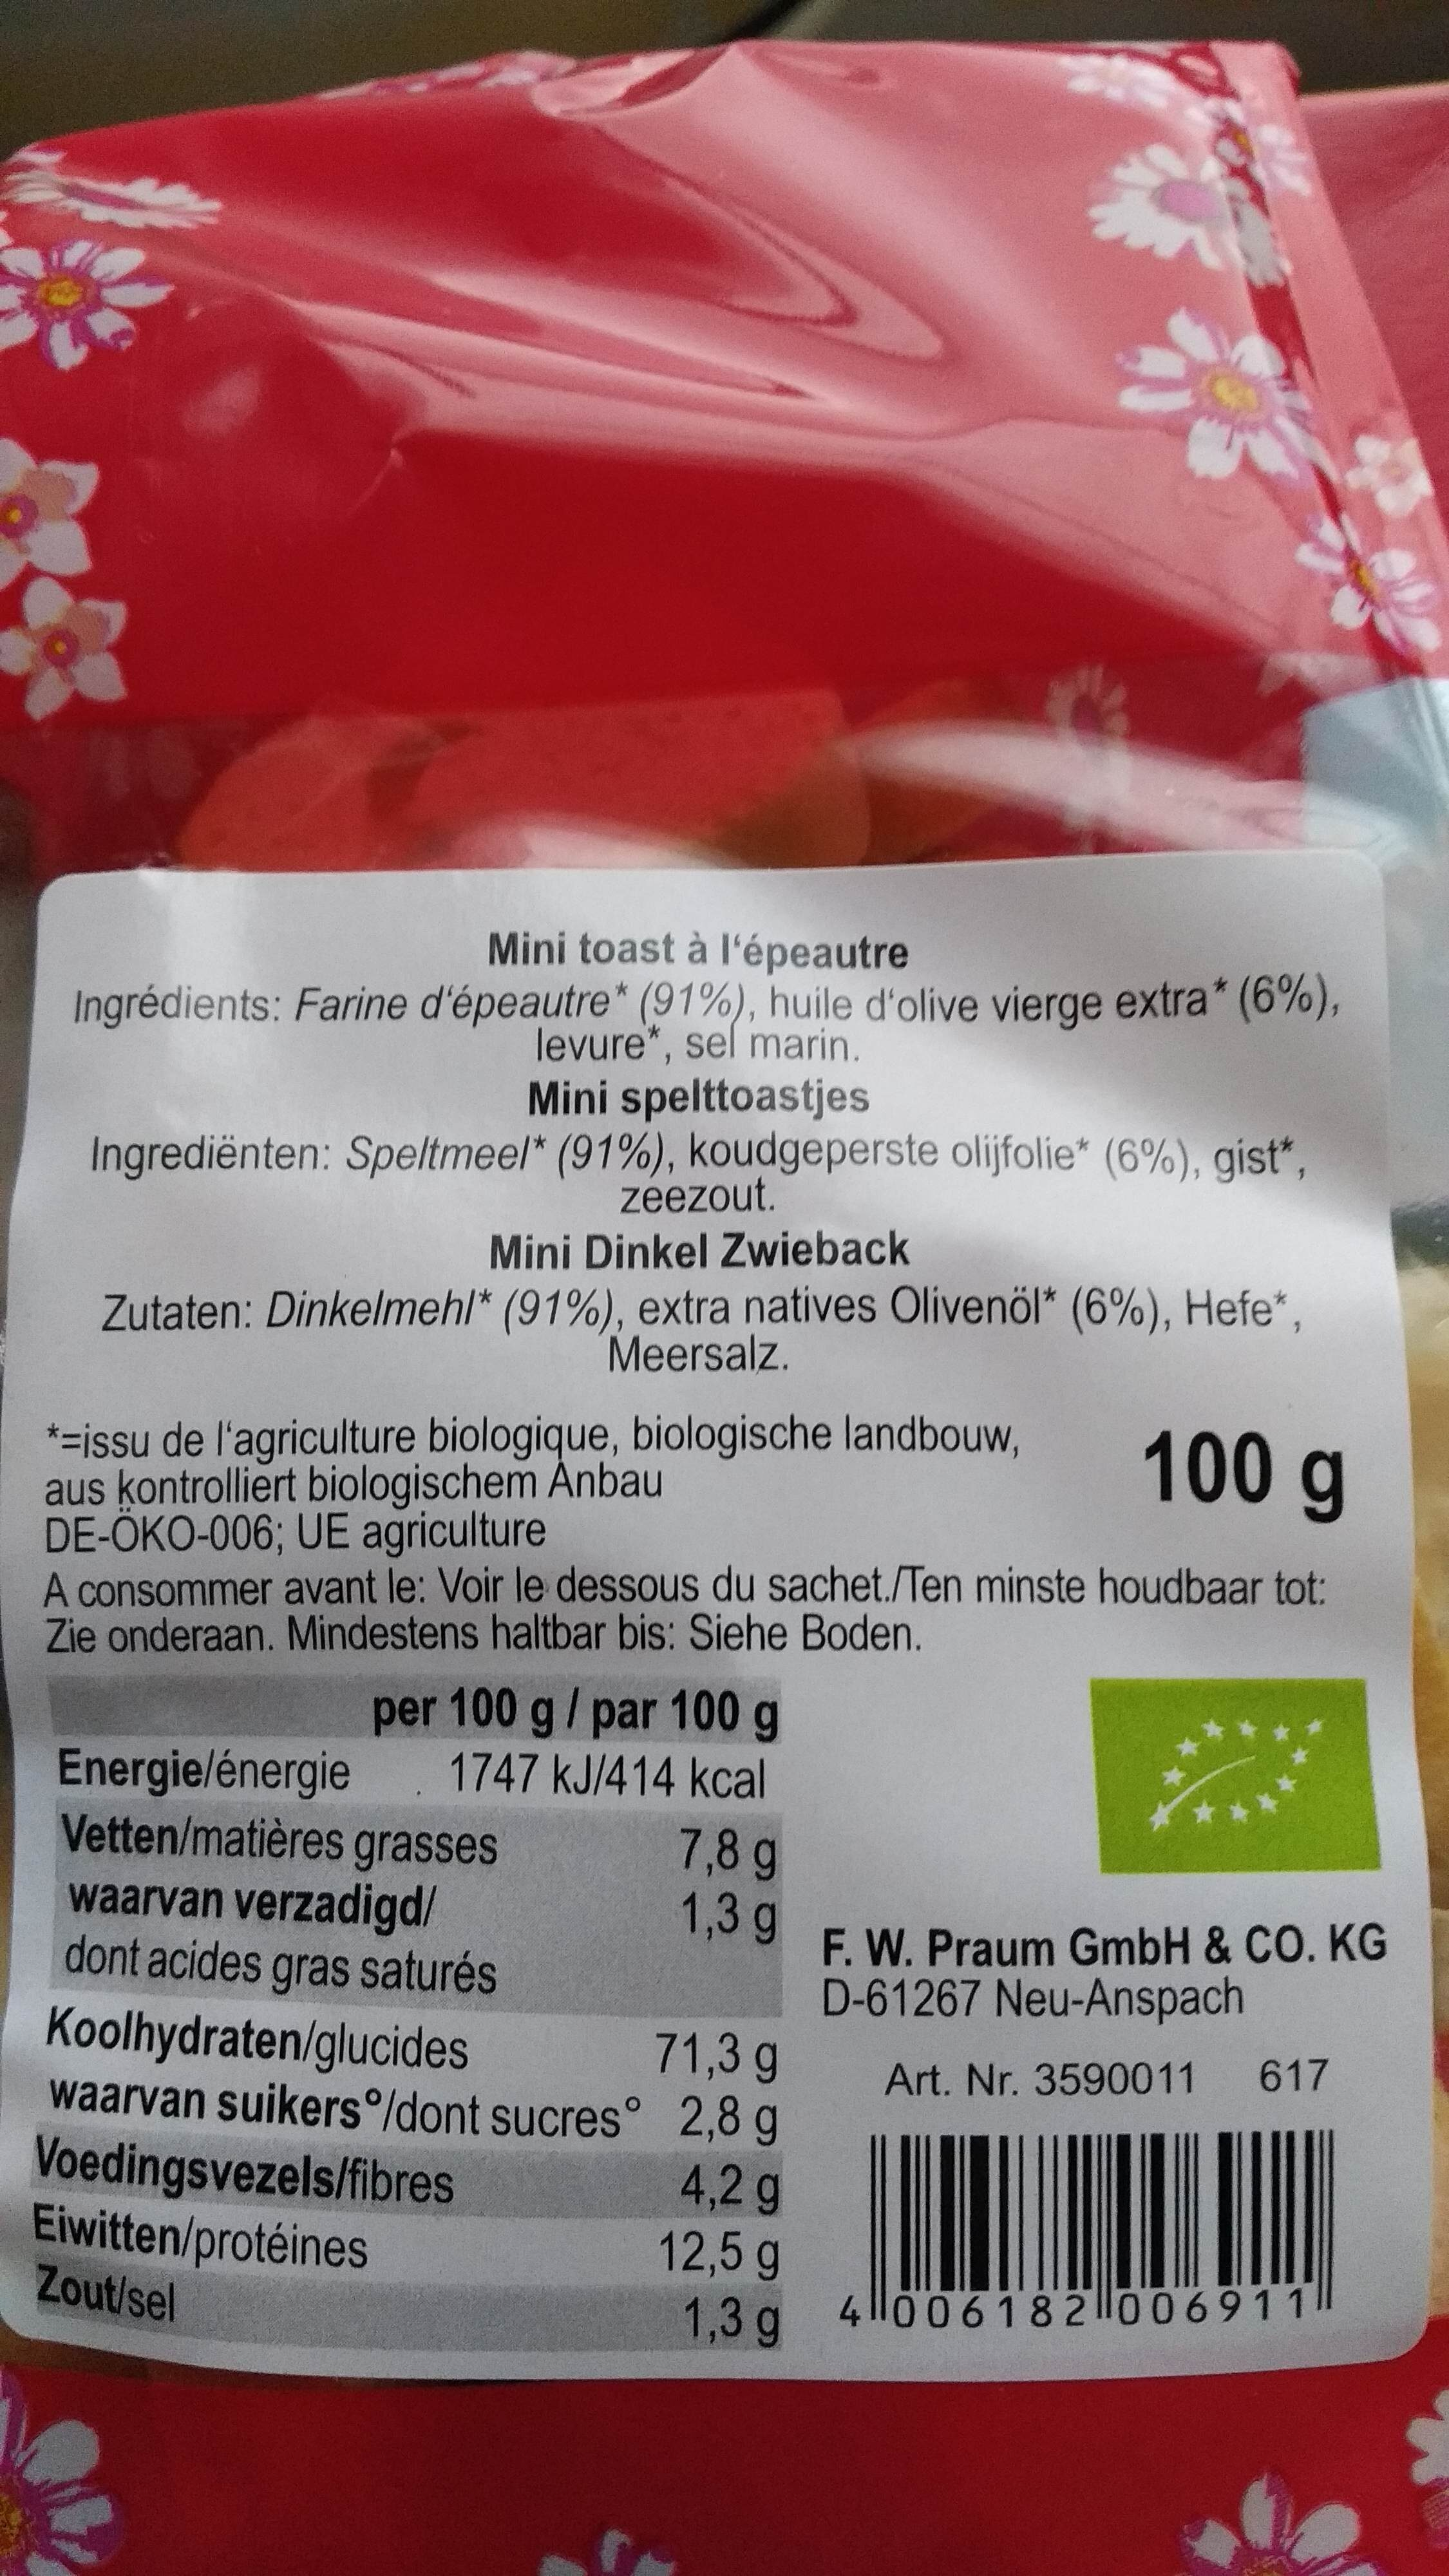 Mini Toasts à l'épautre - Ingrediënten